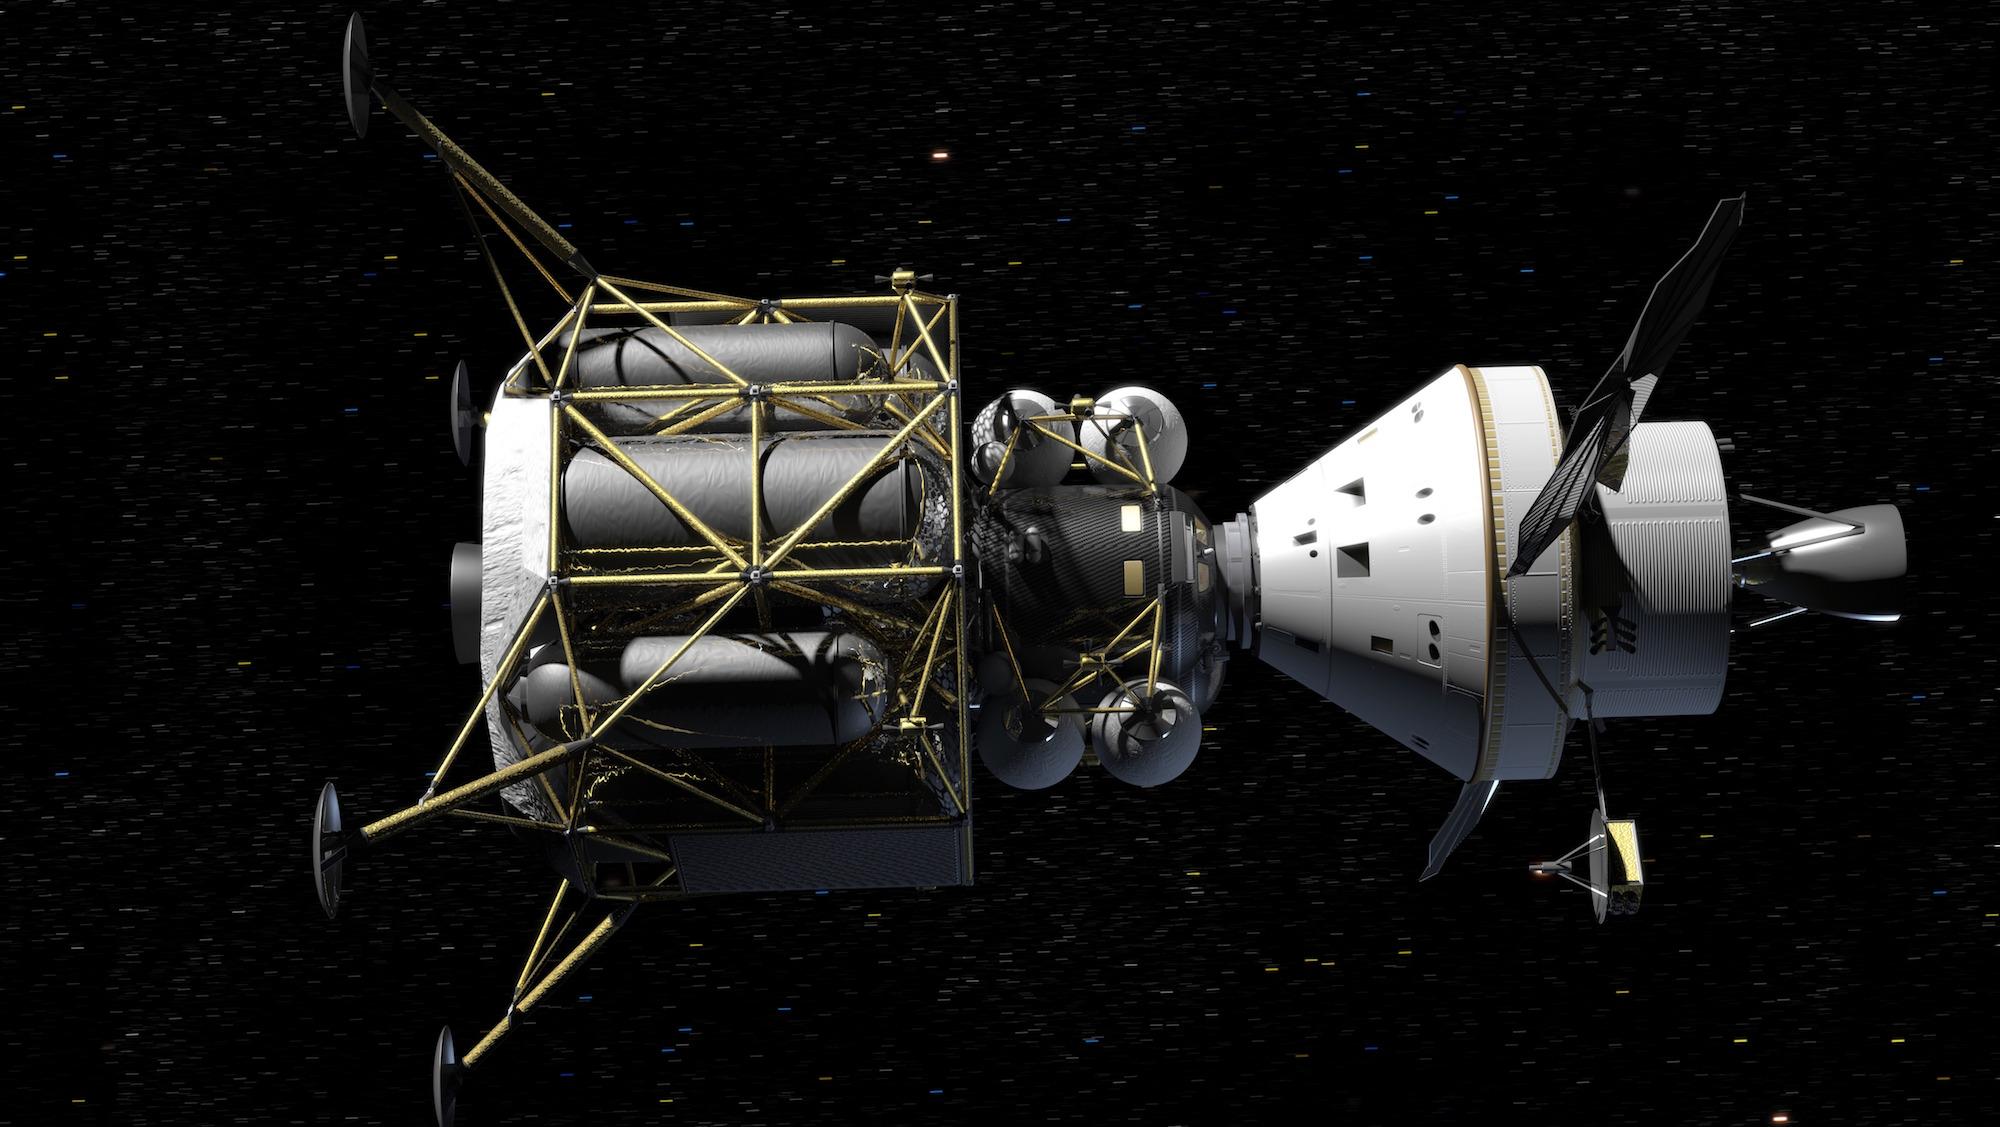 lunar lander craft